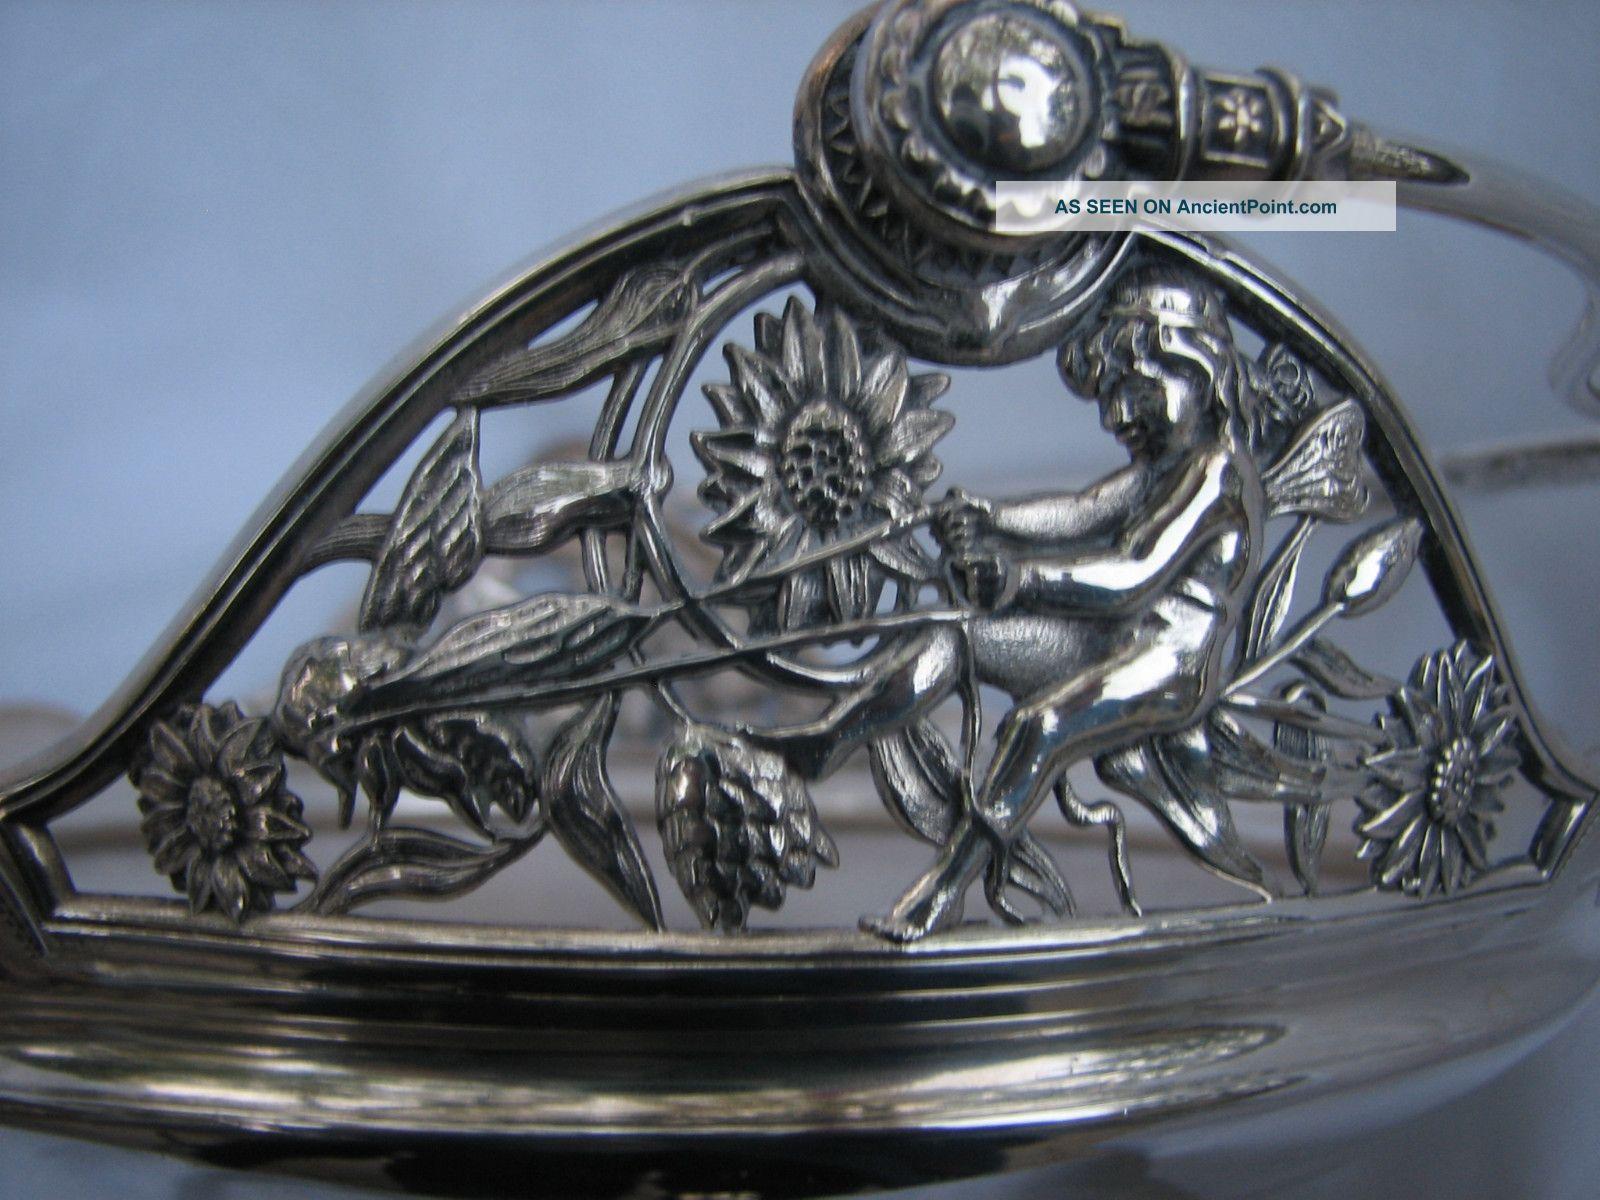 Antique Aesthetic Meriden Silverplate Brides Basket Fairies Butterfly Bat Dragon Baskets photo